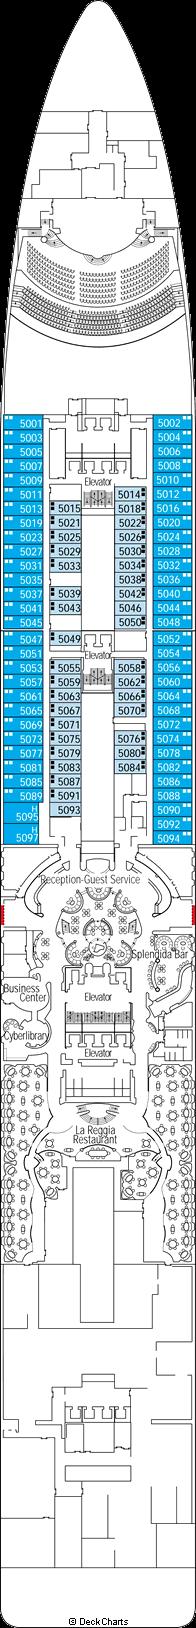 MSC Splendida - Deck Plans, Reviews & Pictures - TripAdvisor